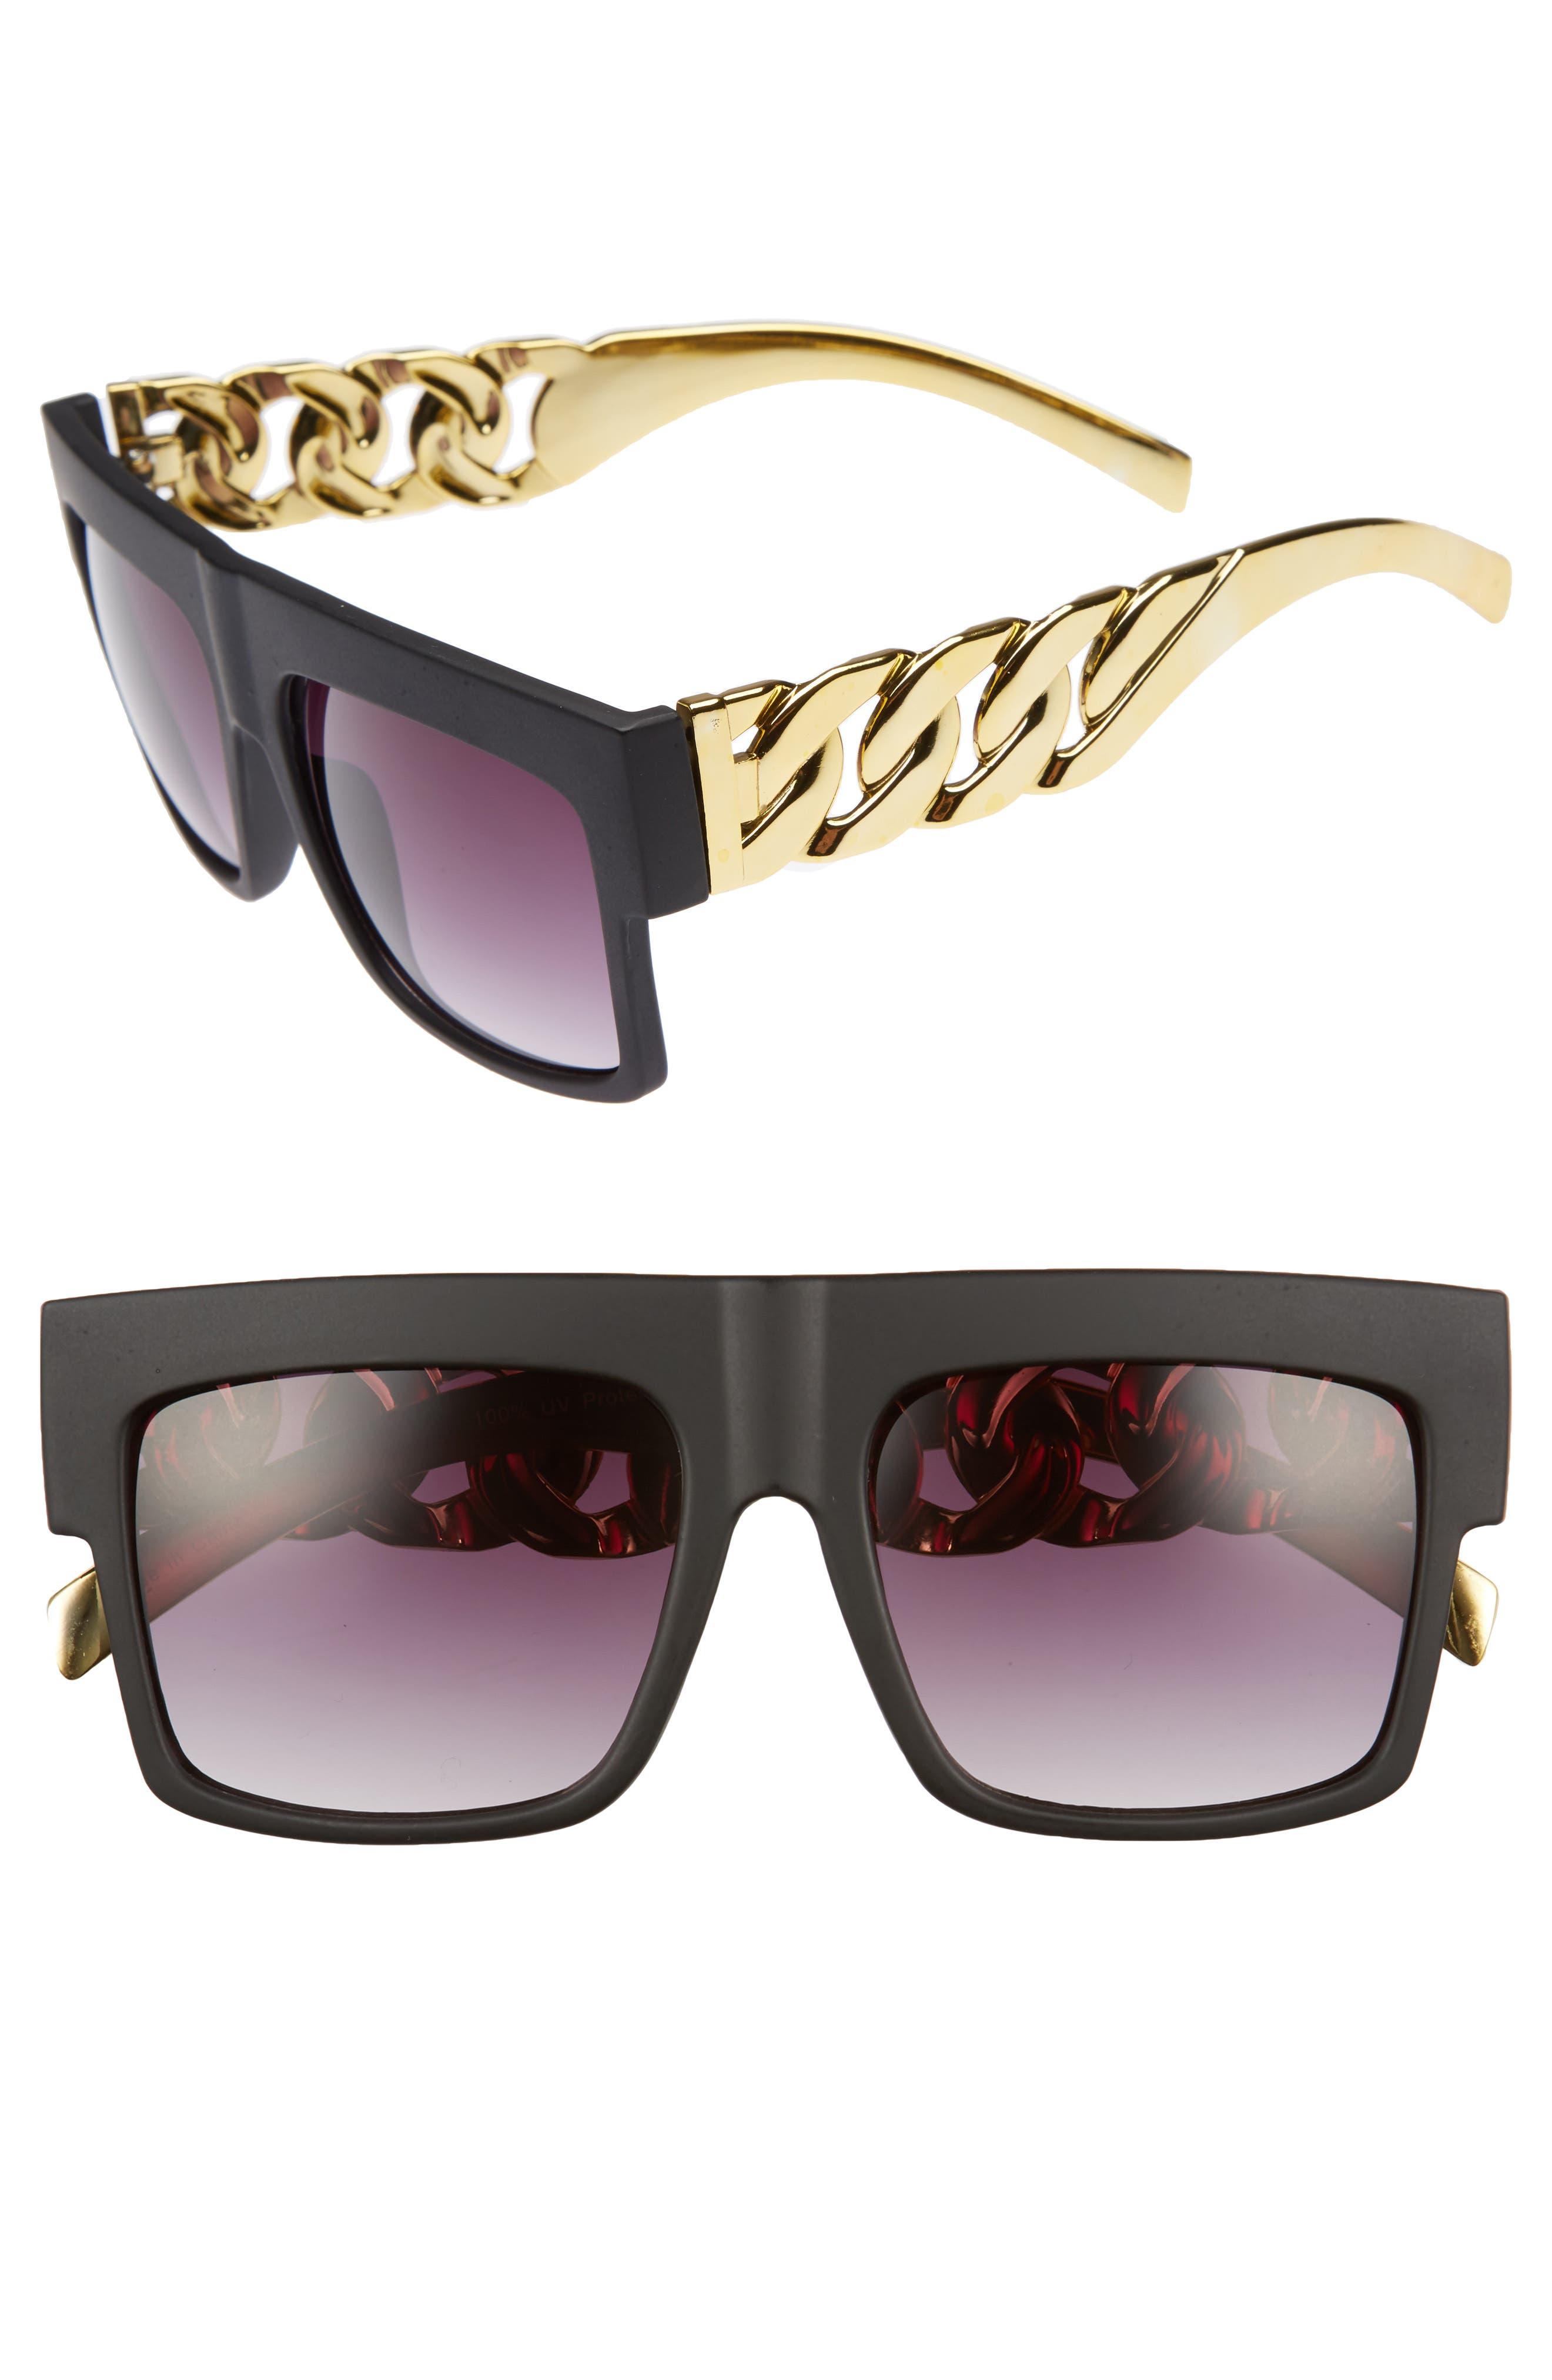 52mm Chain Detail Shield Sunglasses,                             Main thumbnail 1, color,                             001